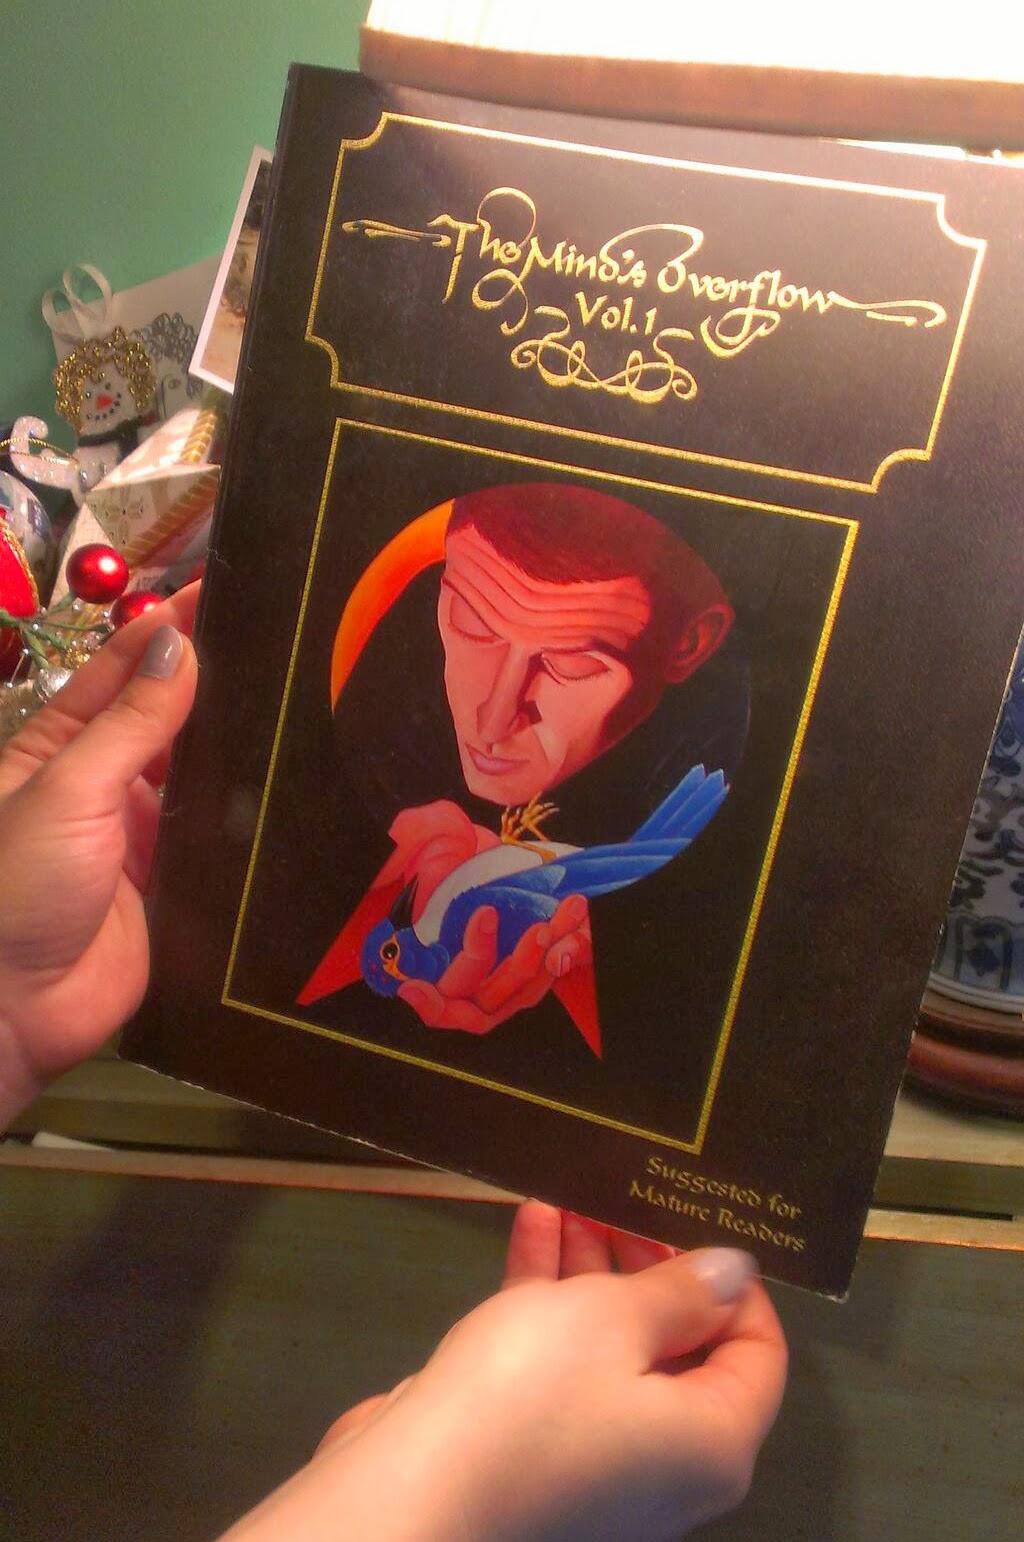 Mirror Image Book - AbeBooks